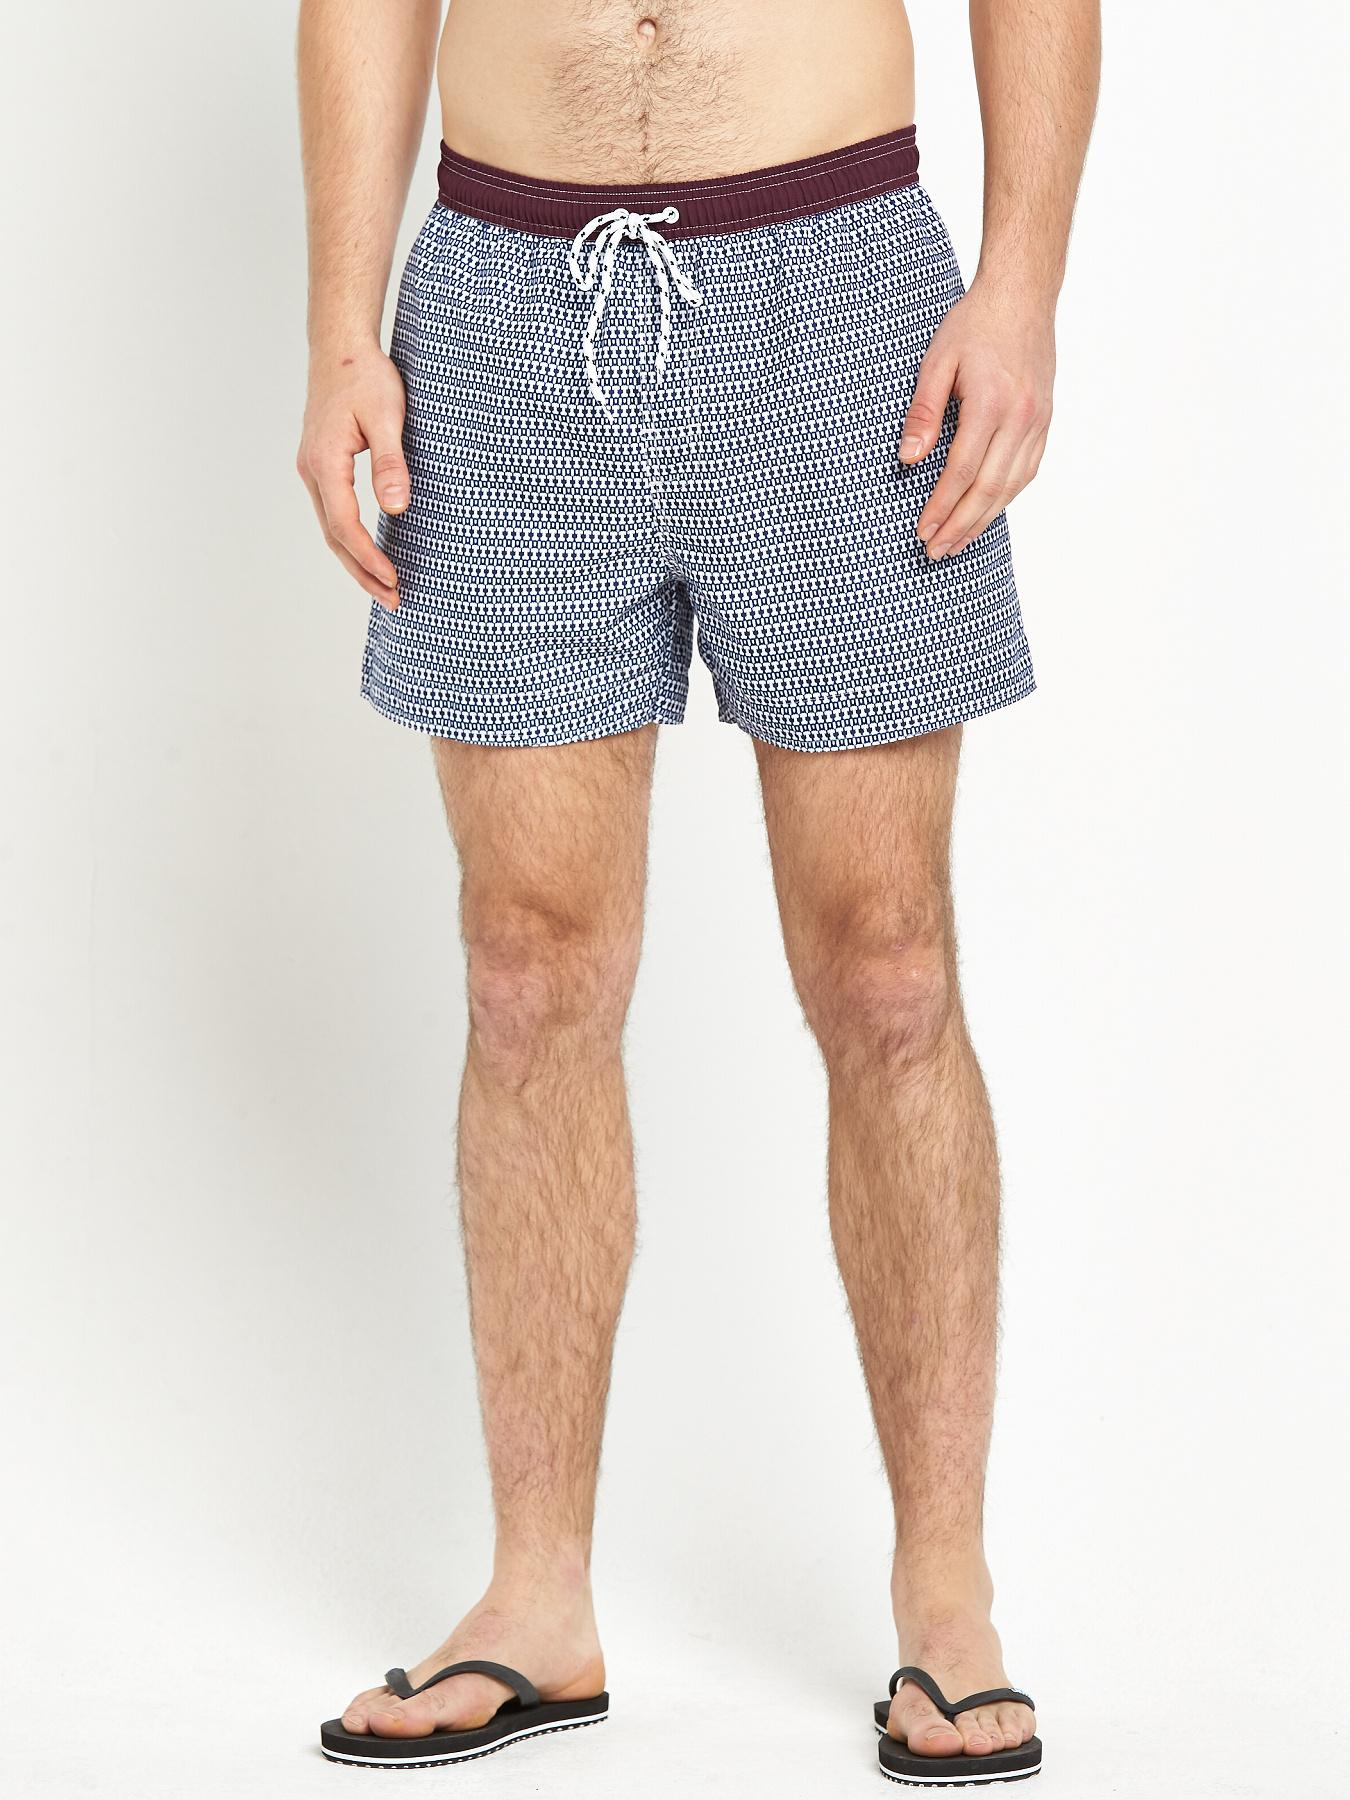 Goodsouls Mens Printed Swimshorts - Navy, Navy